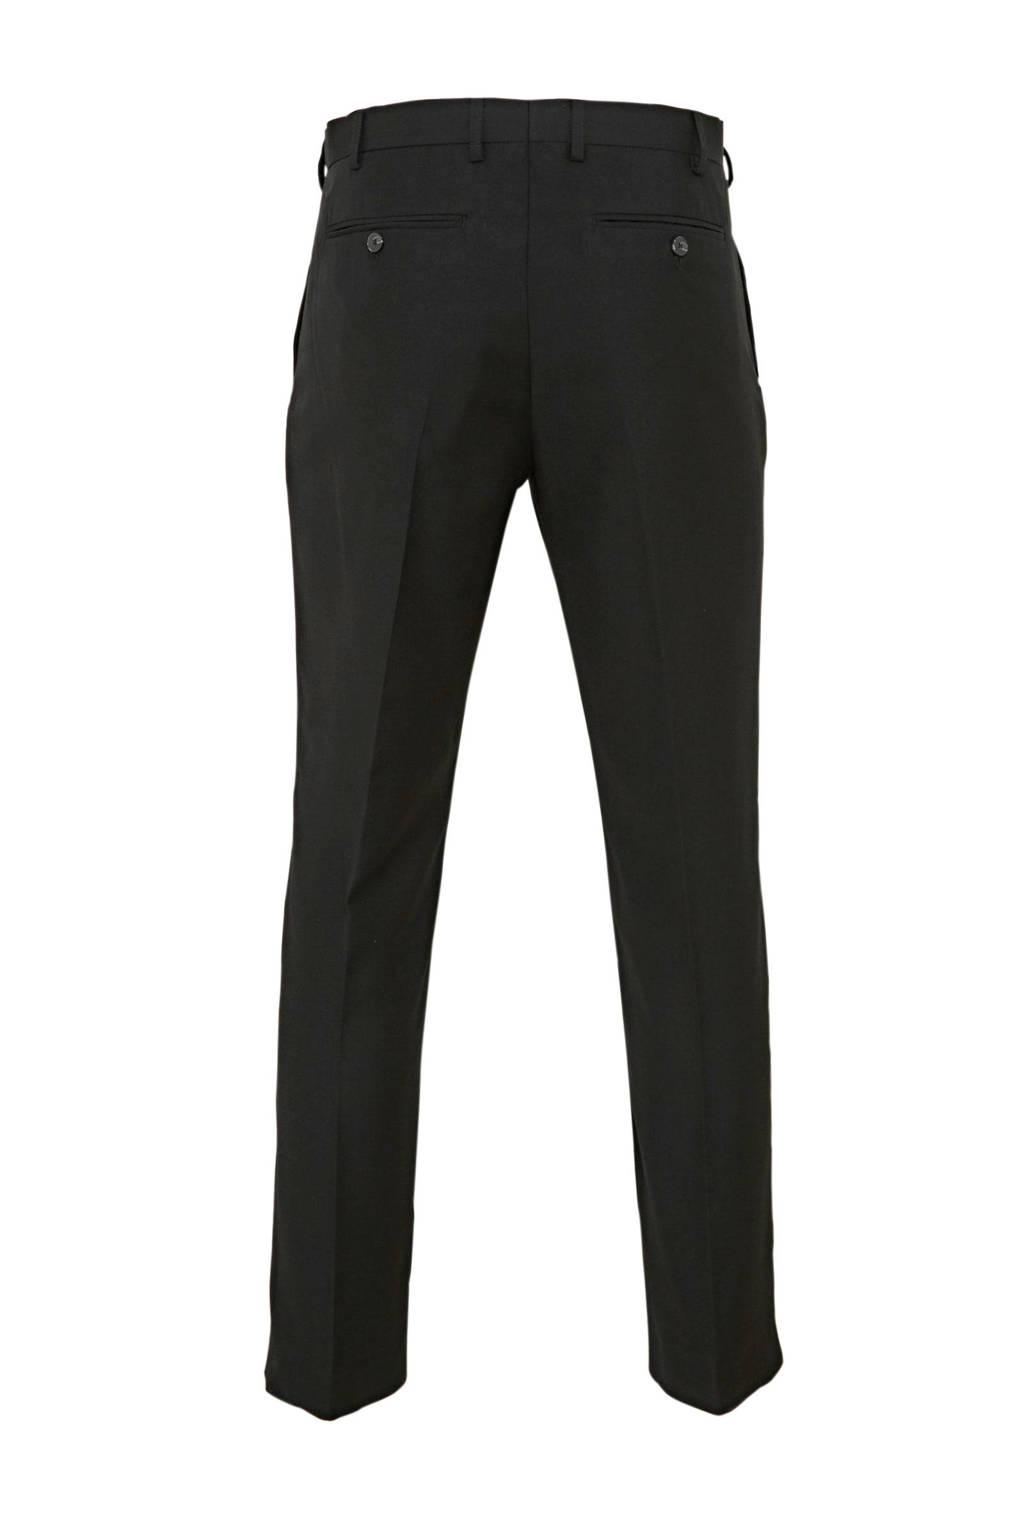 C&A Angelo Litrico slim fit pantalon zwart, Zwart